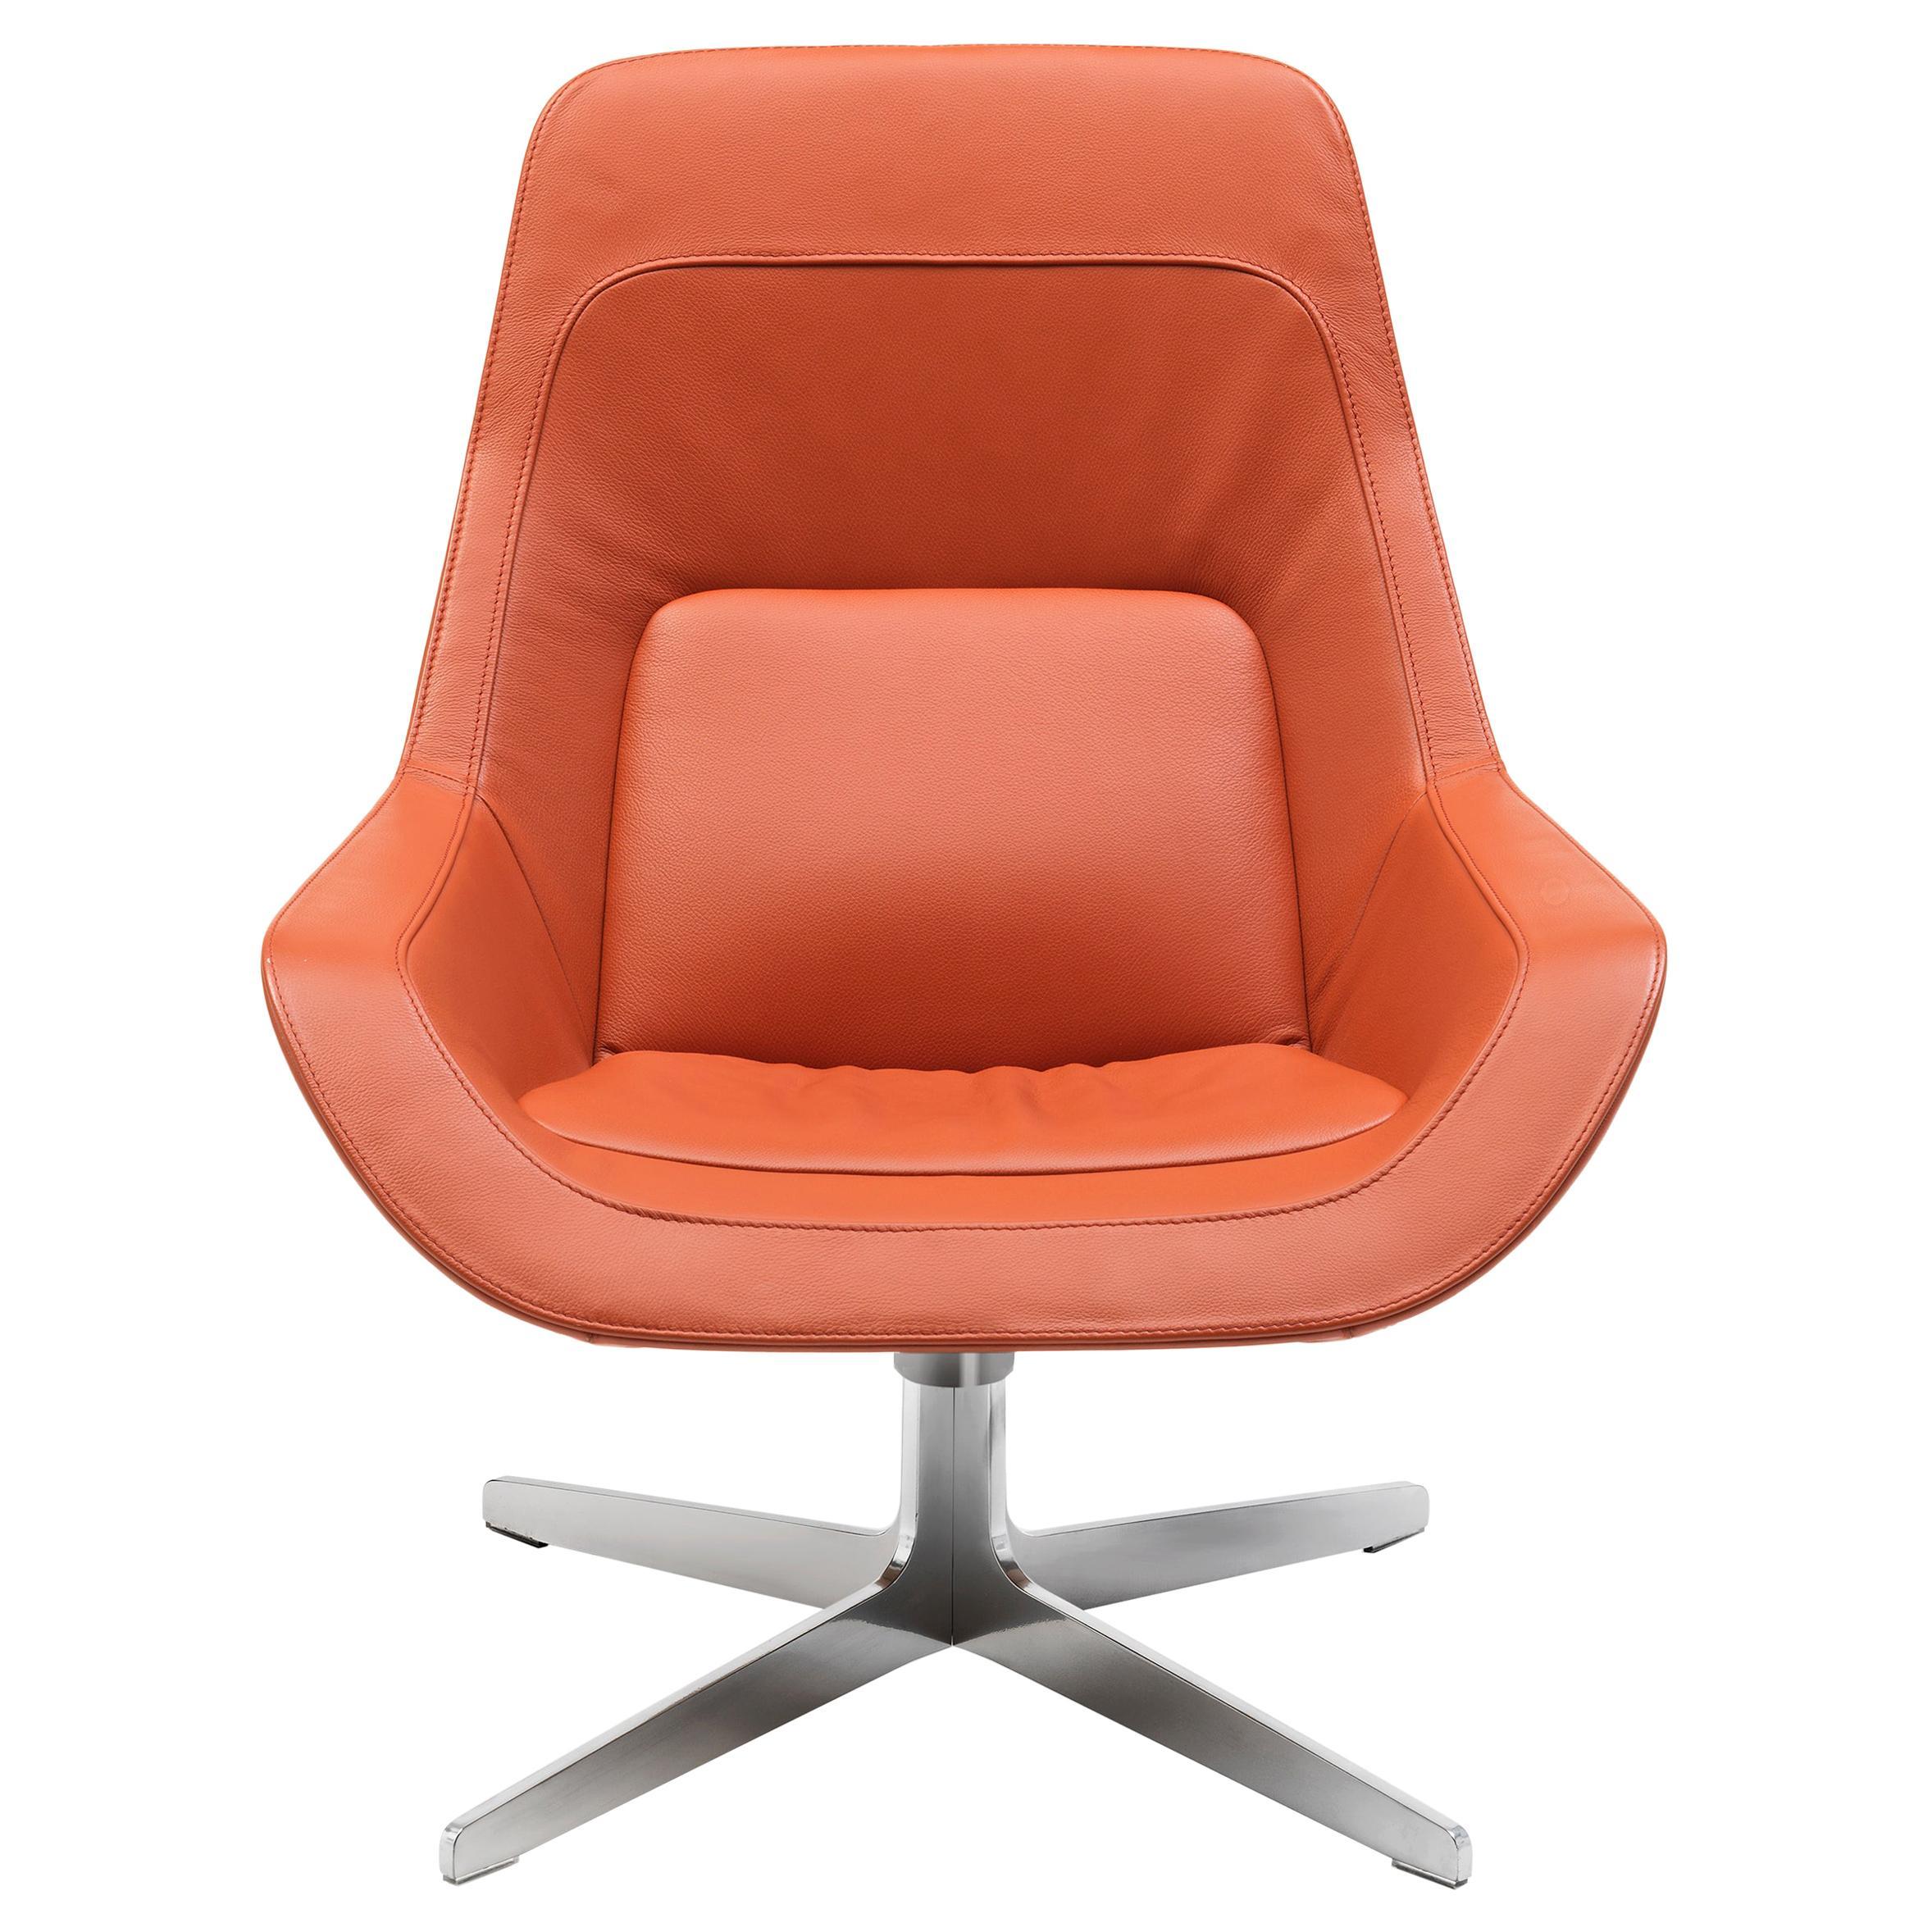 De Sede Lounge Chairs